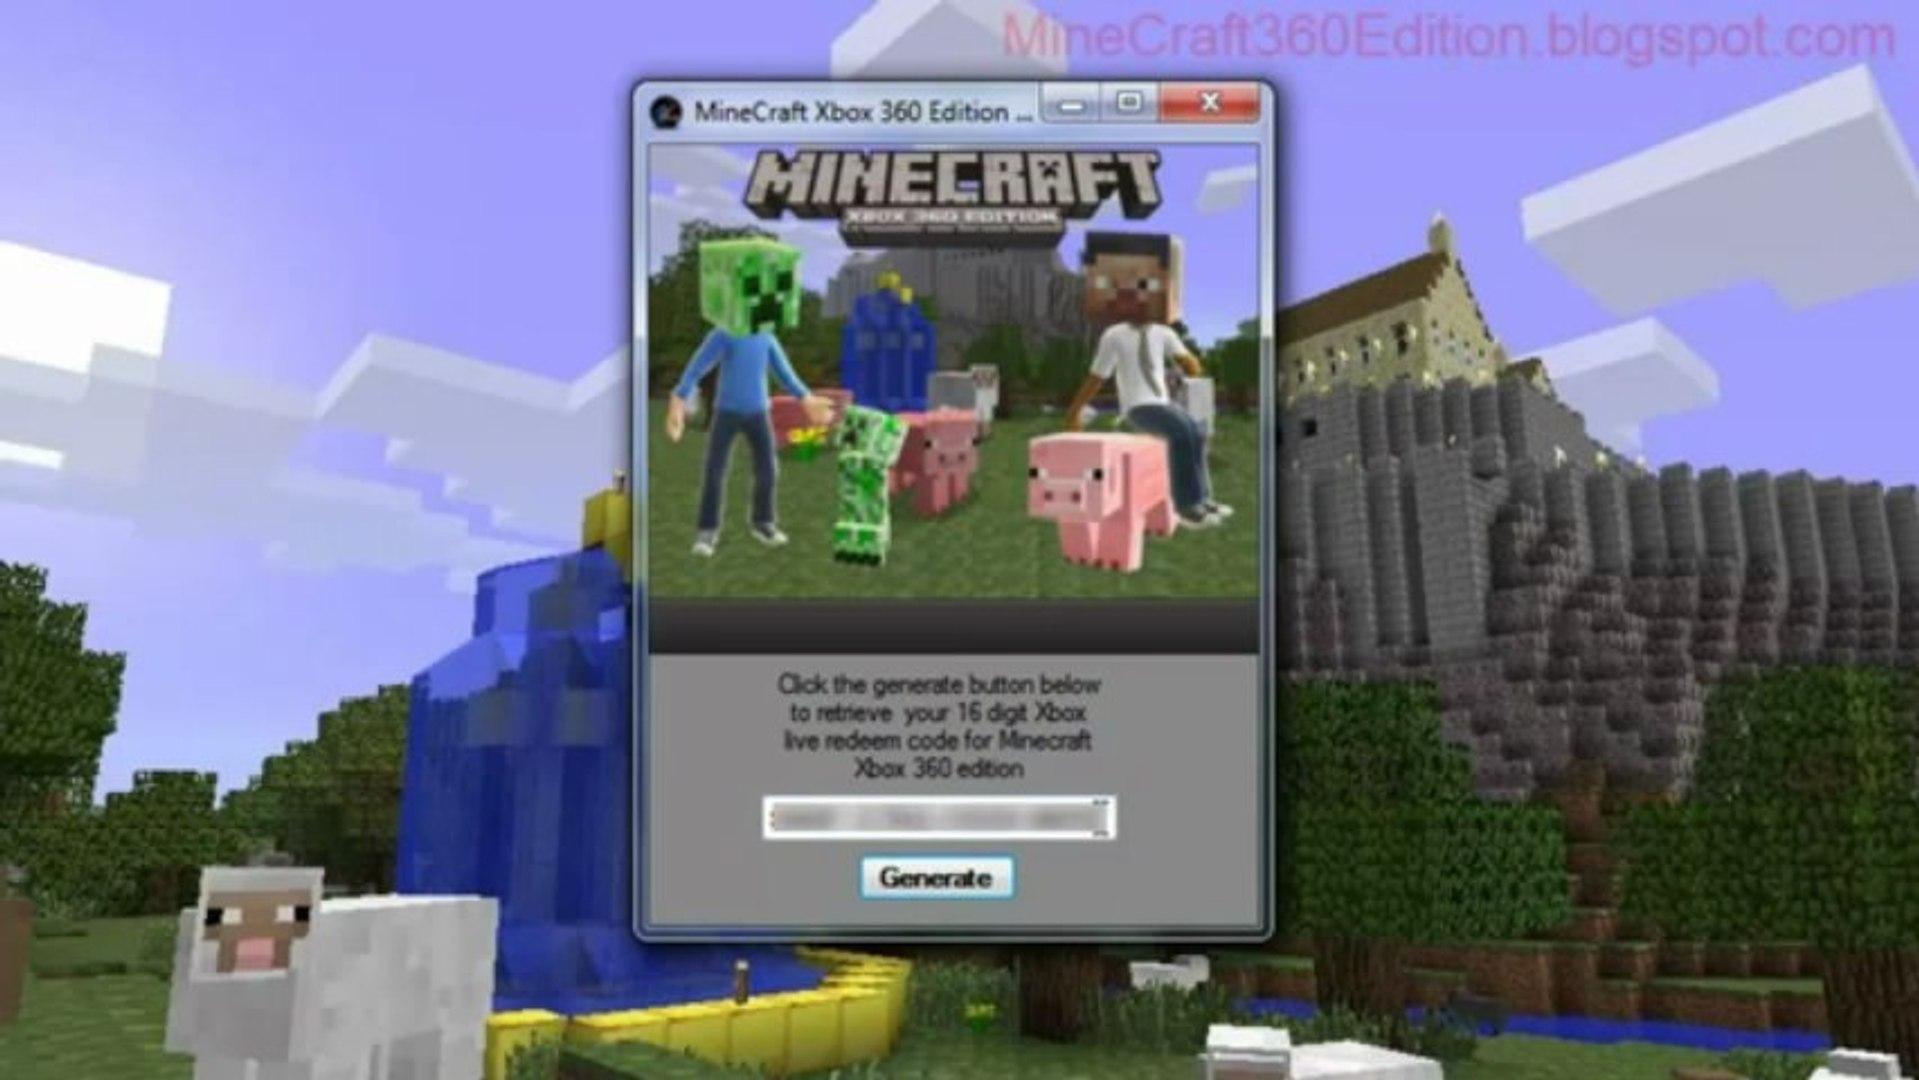 Minecraft Xbox 360 Edition Gift code generator 101% working setup exe